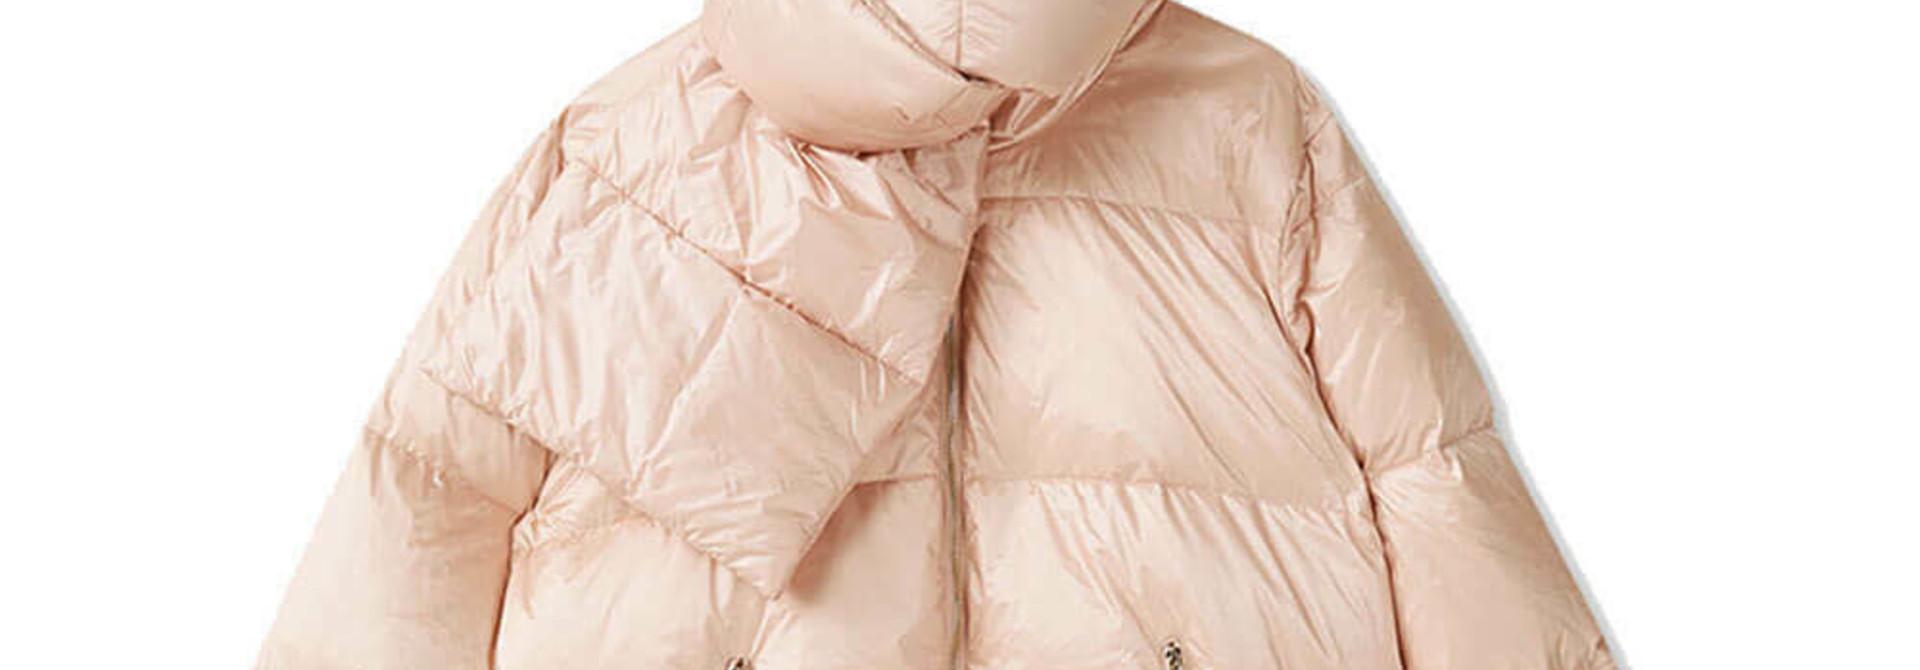 Down jacket brunico